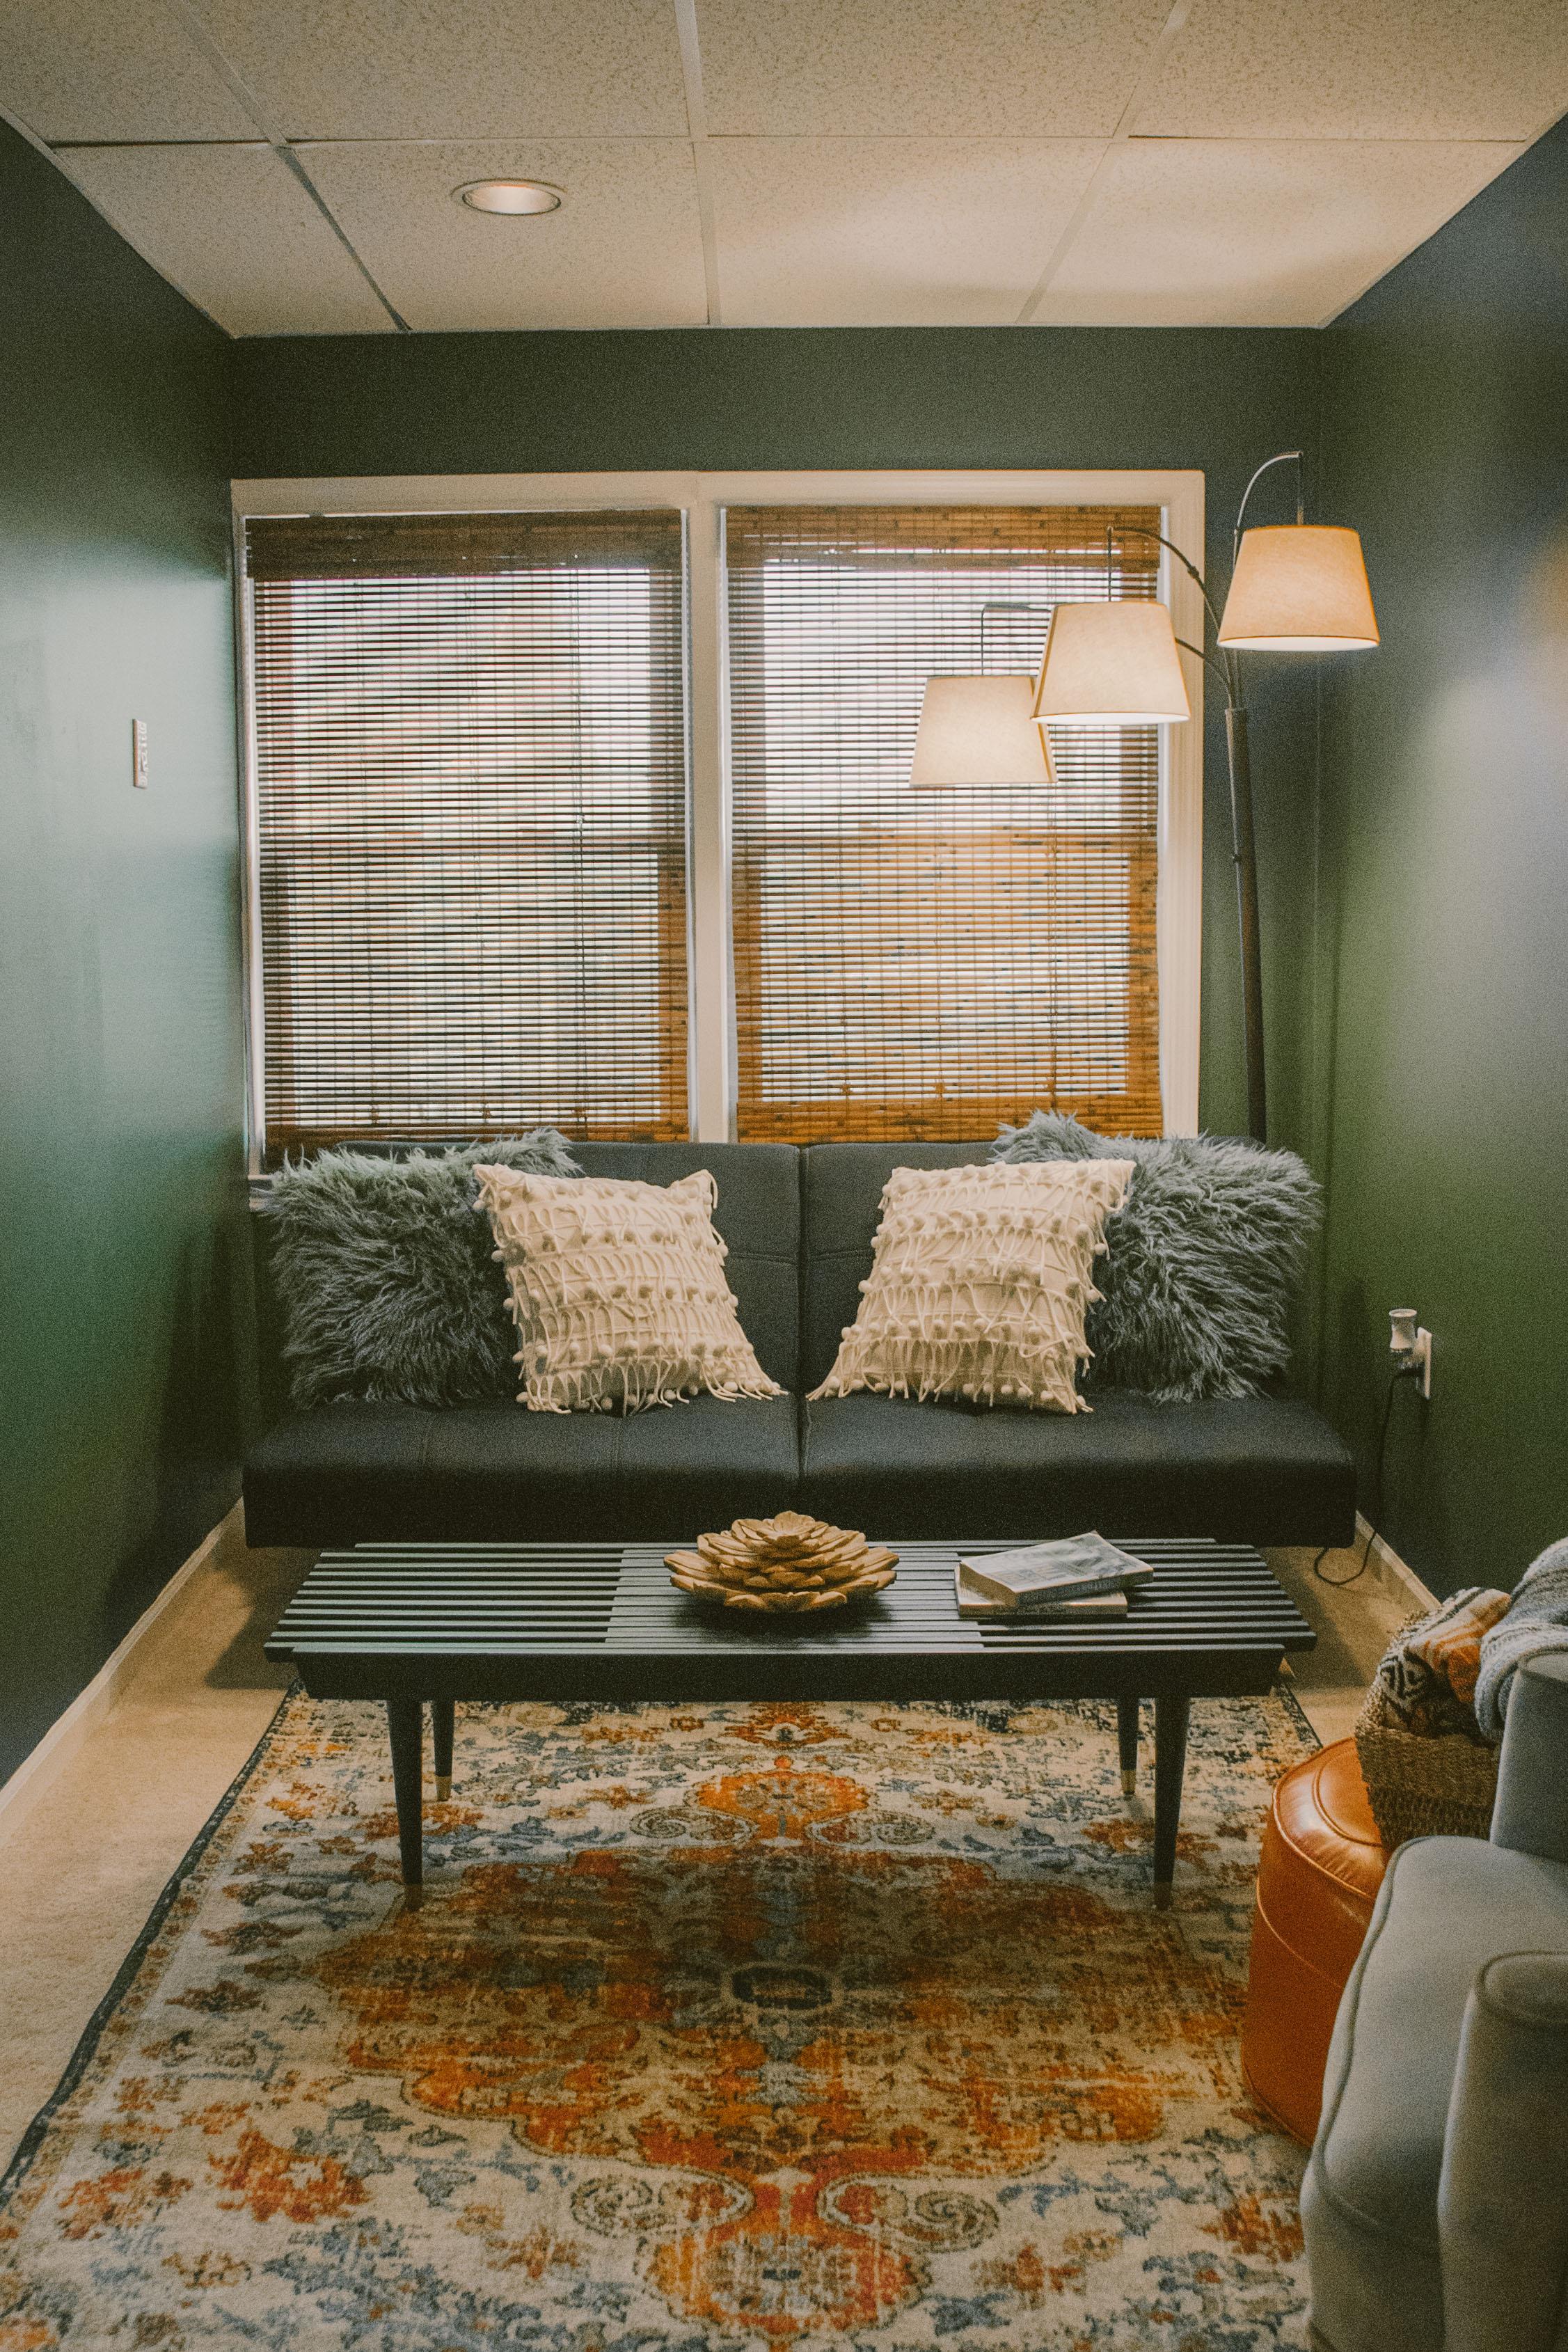 Airbnb-3.jpg